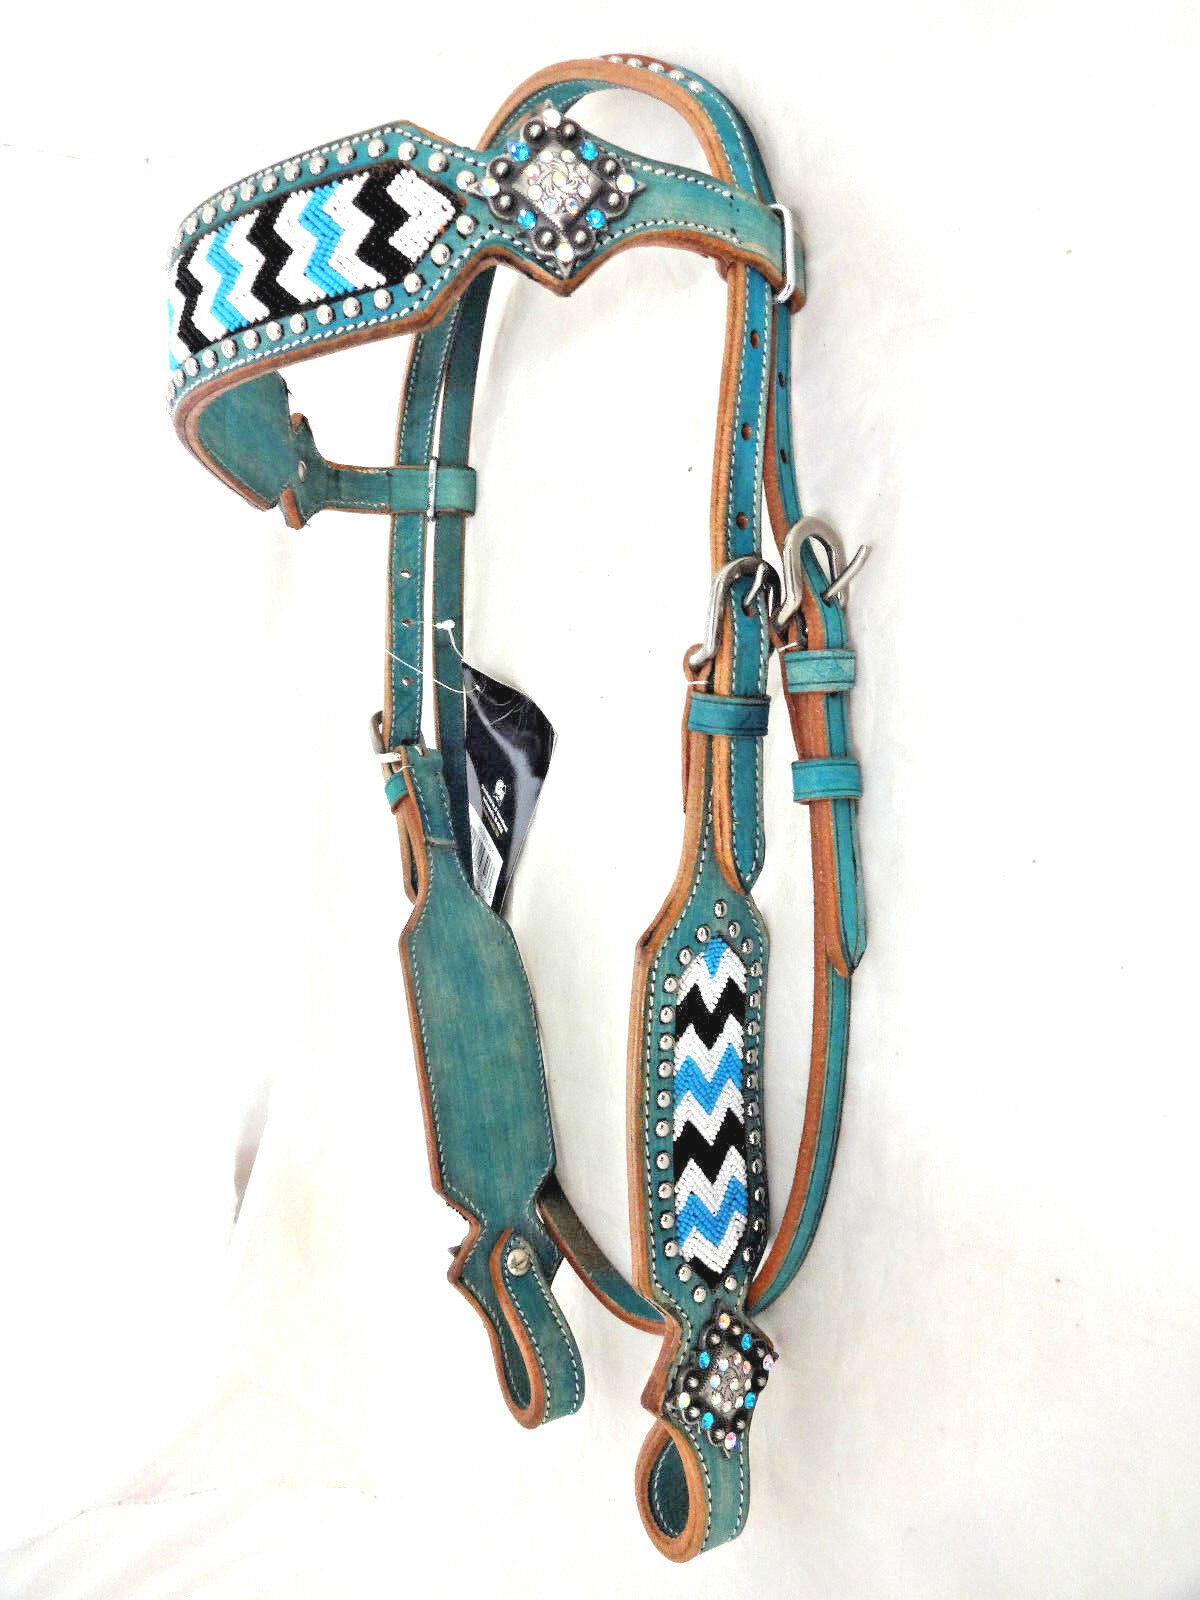 Cabezada de cuero con cuentas de cristal de Chase Conchos Turquesa Tachuela del caballo plata Royal